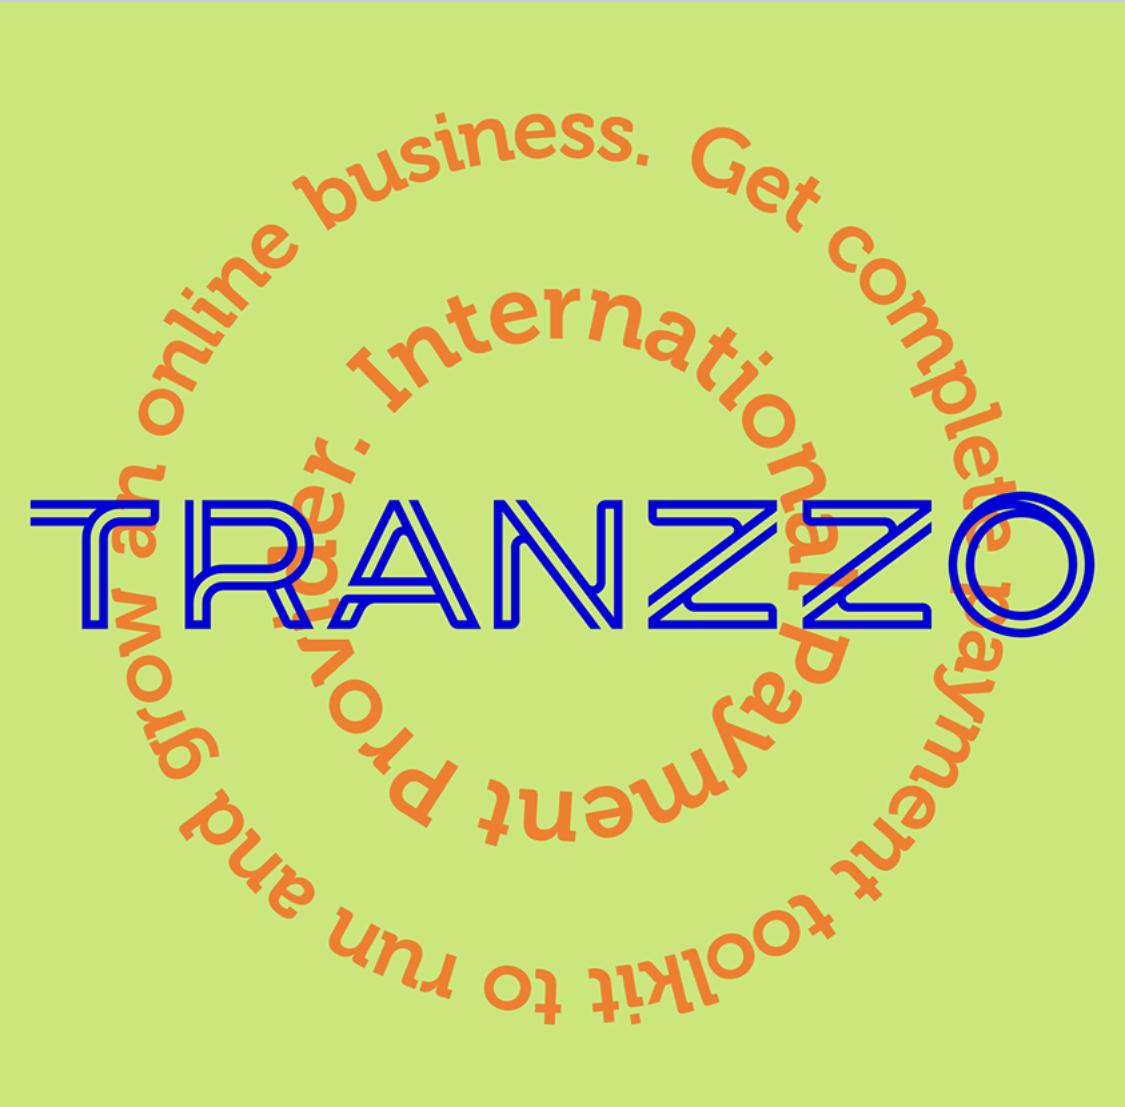 Tranzzo